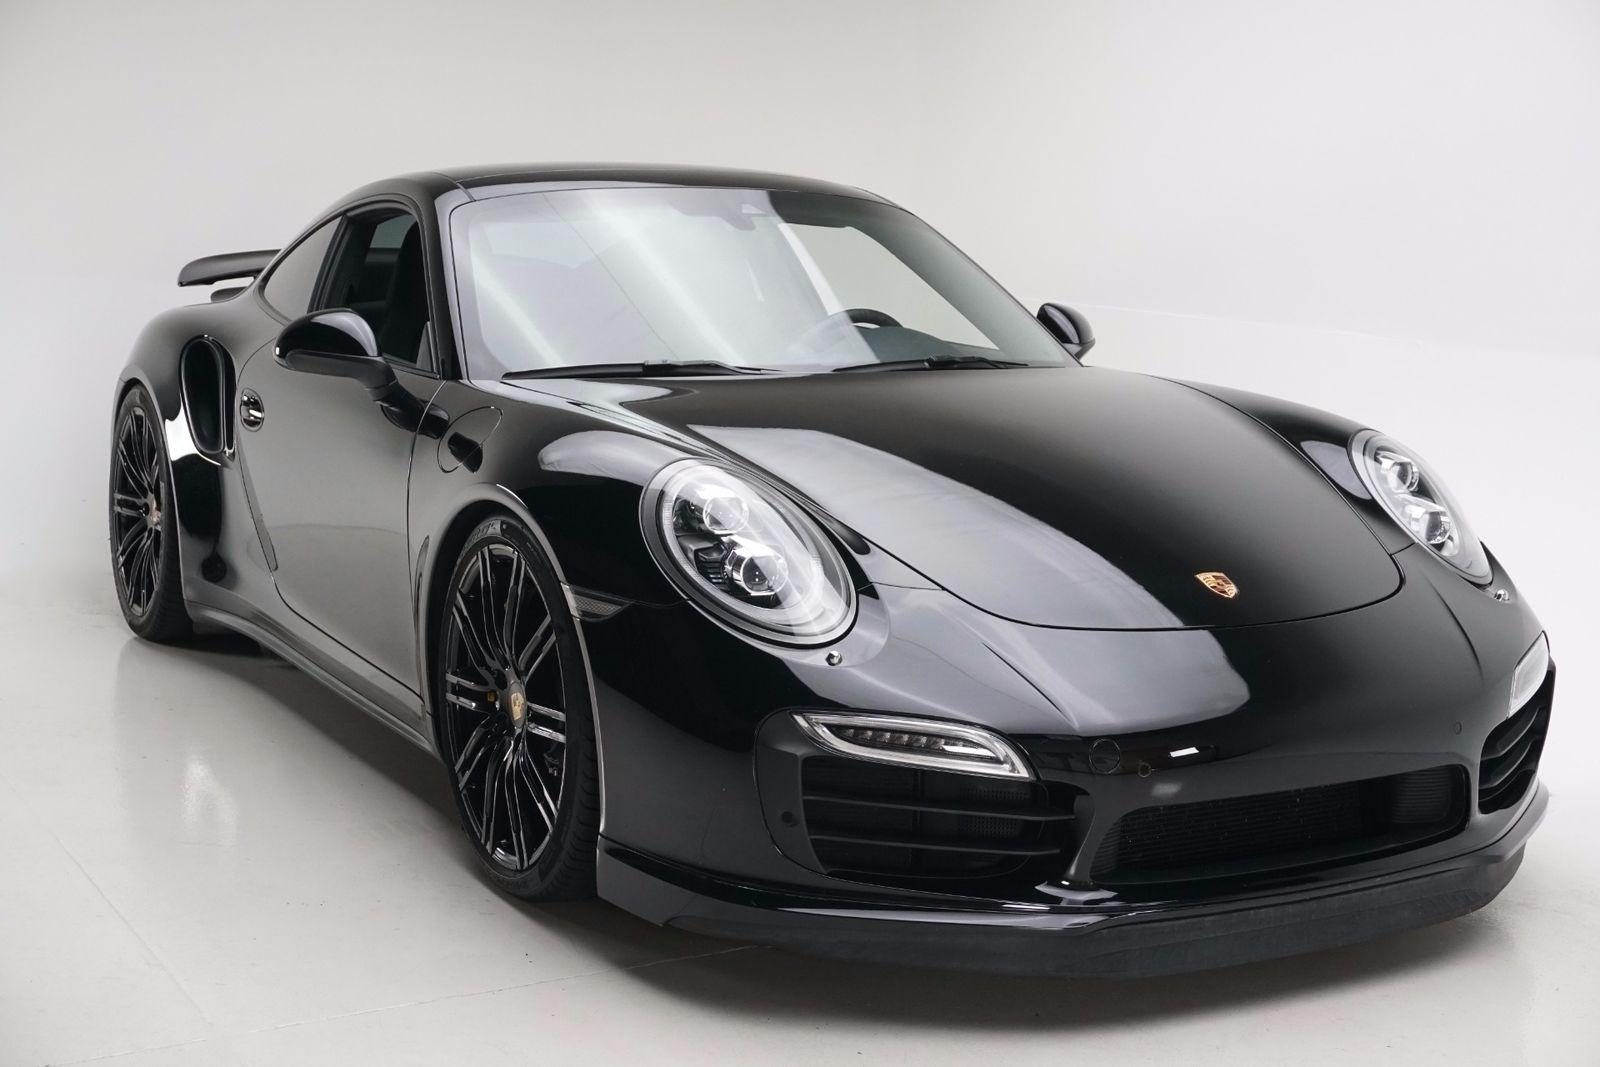 awesome 2014 porsche 911 turbo s 2014 porsche 911 turbo s 2018 2019 24carshop. Black Bedroom Furniture Sets. Home Design Ideas